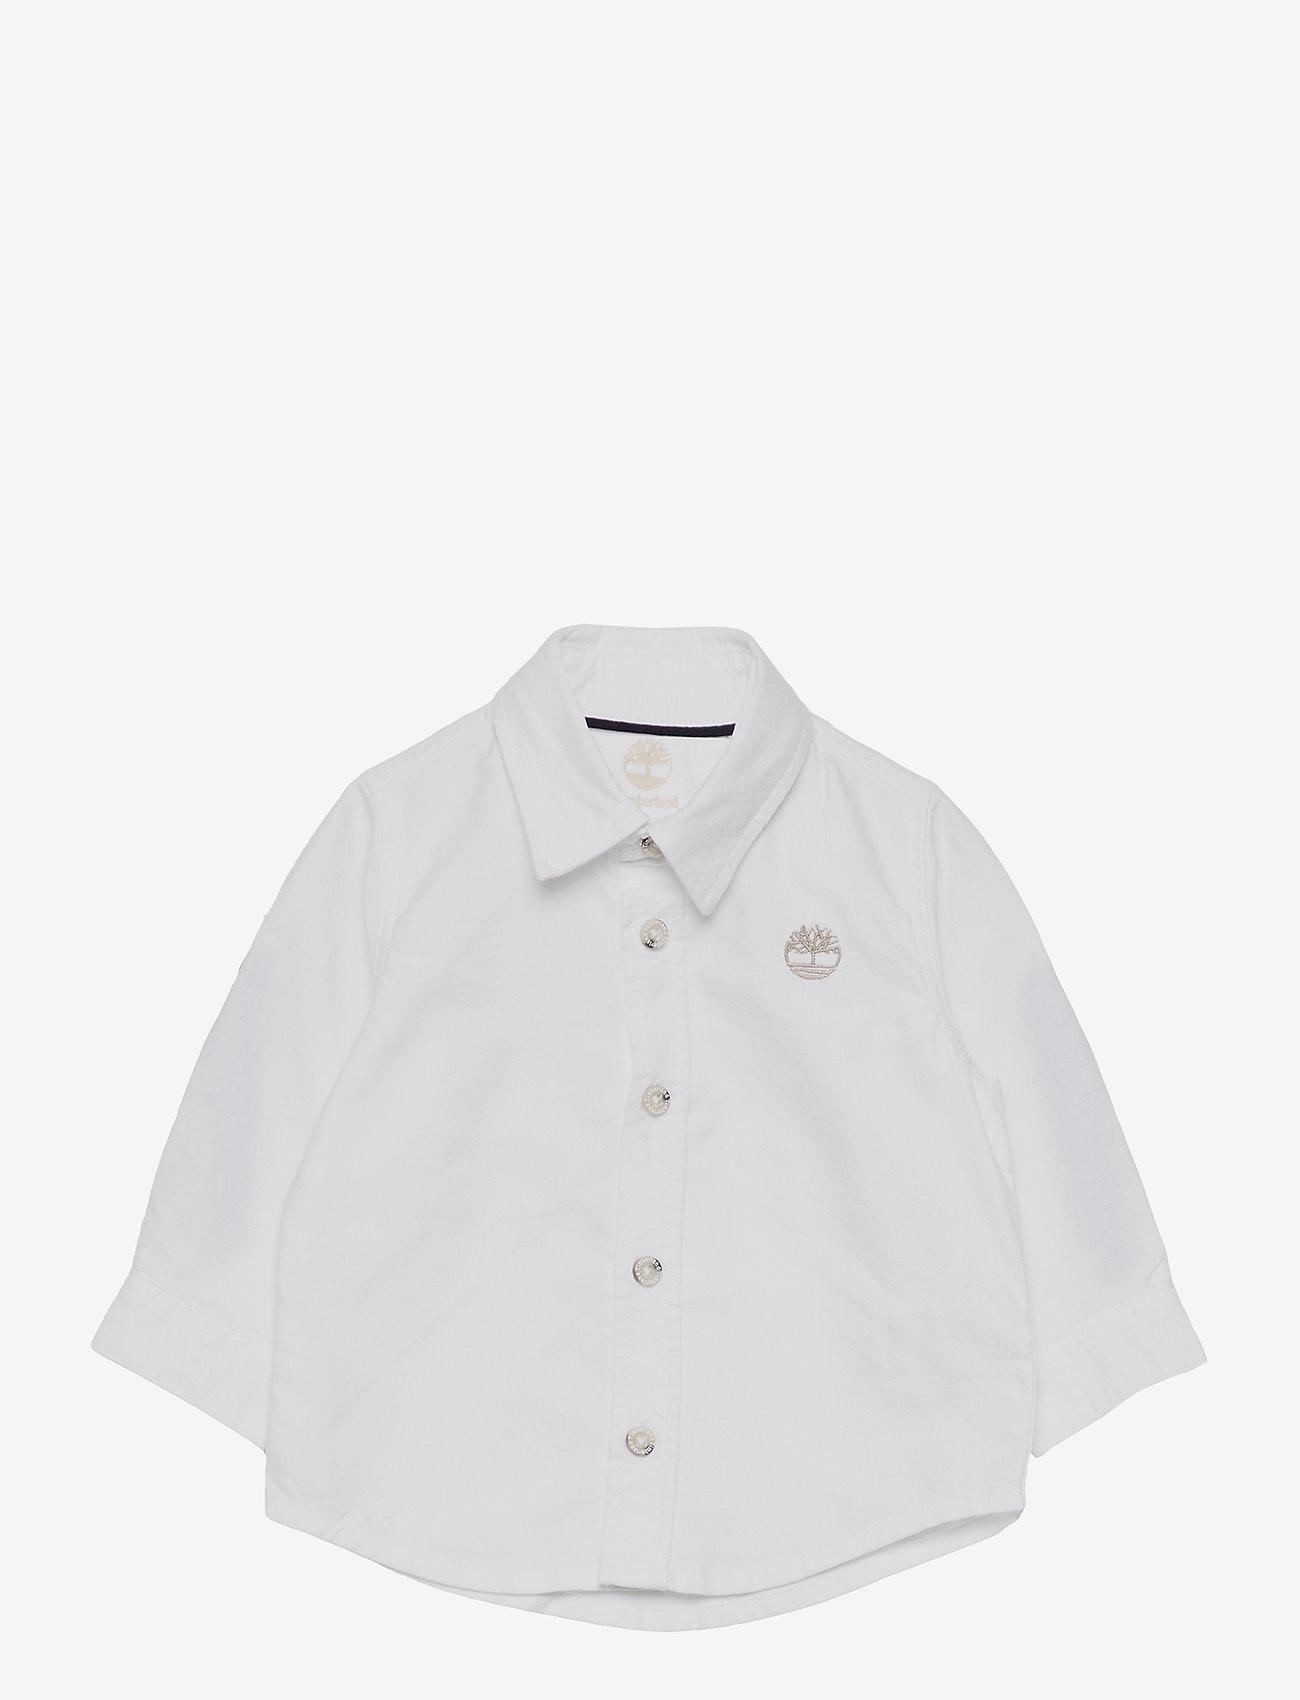 Timberland - LONG SLEEVED SHIRT - shirts - white - 0